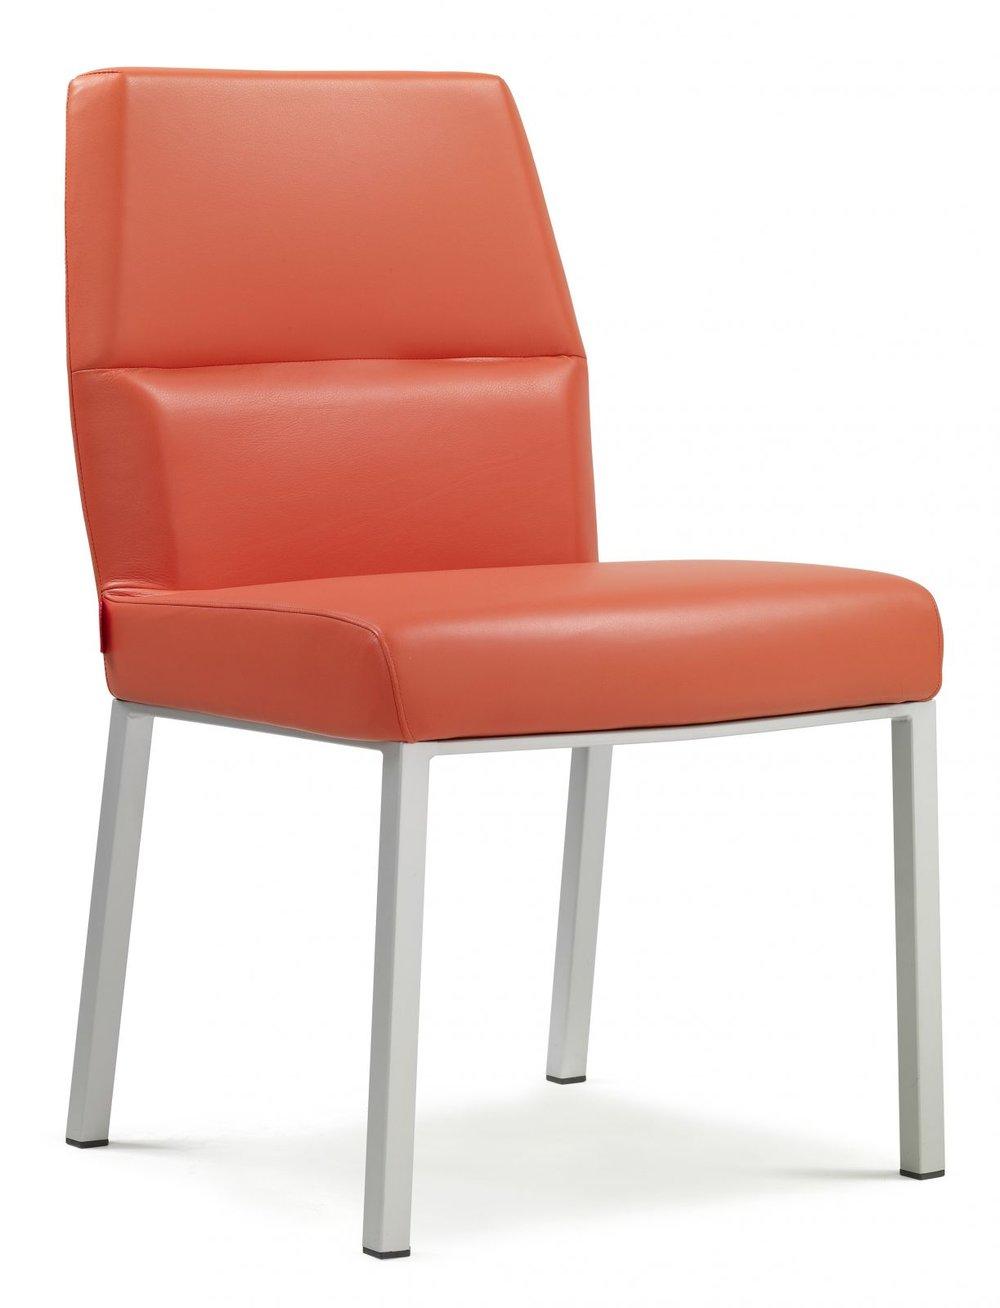 modern-office-furniture-chairs-Italian-designer-furniture (40).jpg